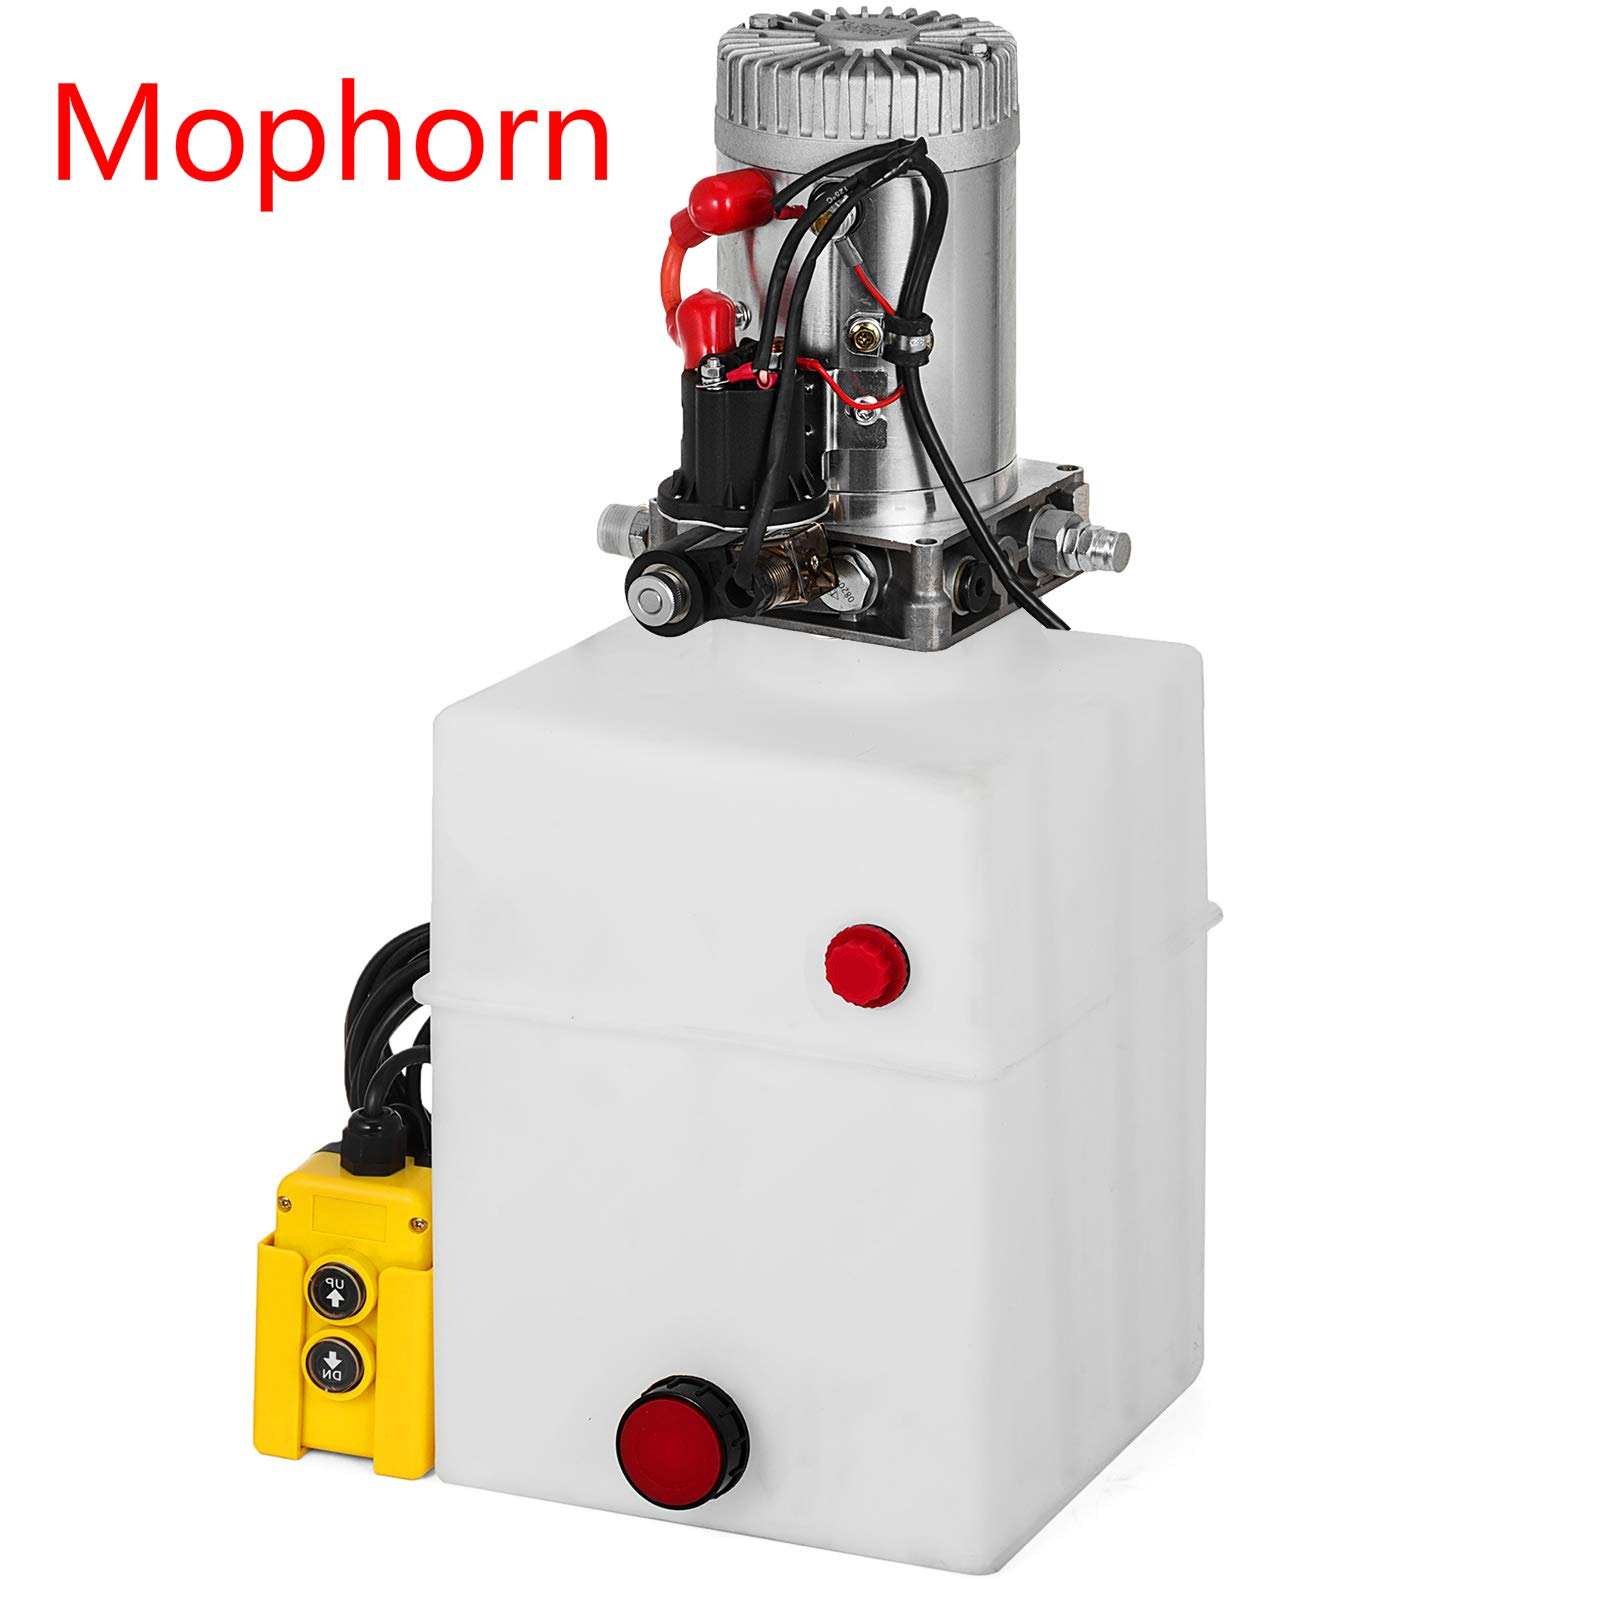 Mophorn Single Acting Hydraulic Dump Trailer Pump Plastic Poly Reservoir(12VDC Single Action Powering Unit, SAE #6 Ports, 3200 PSI, 20 Quart Reservoir)